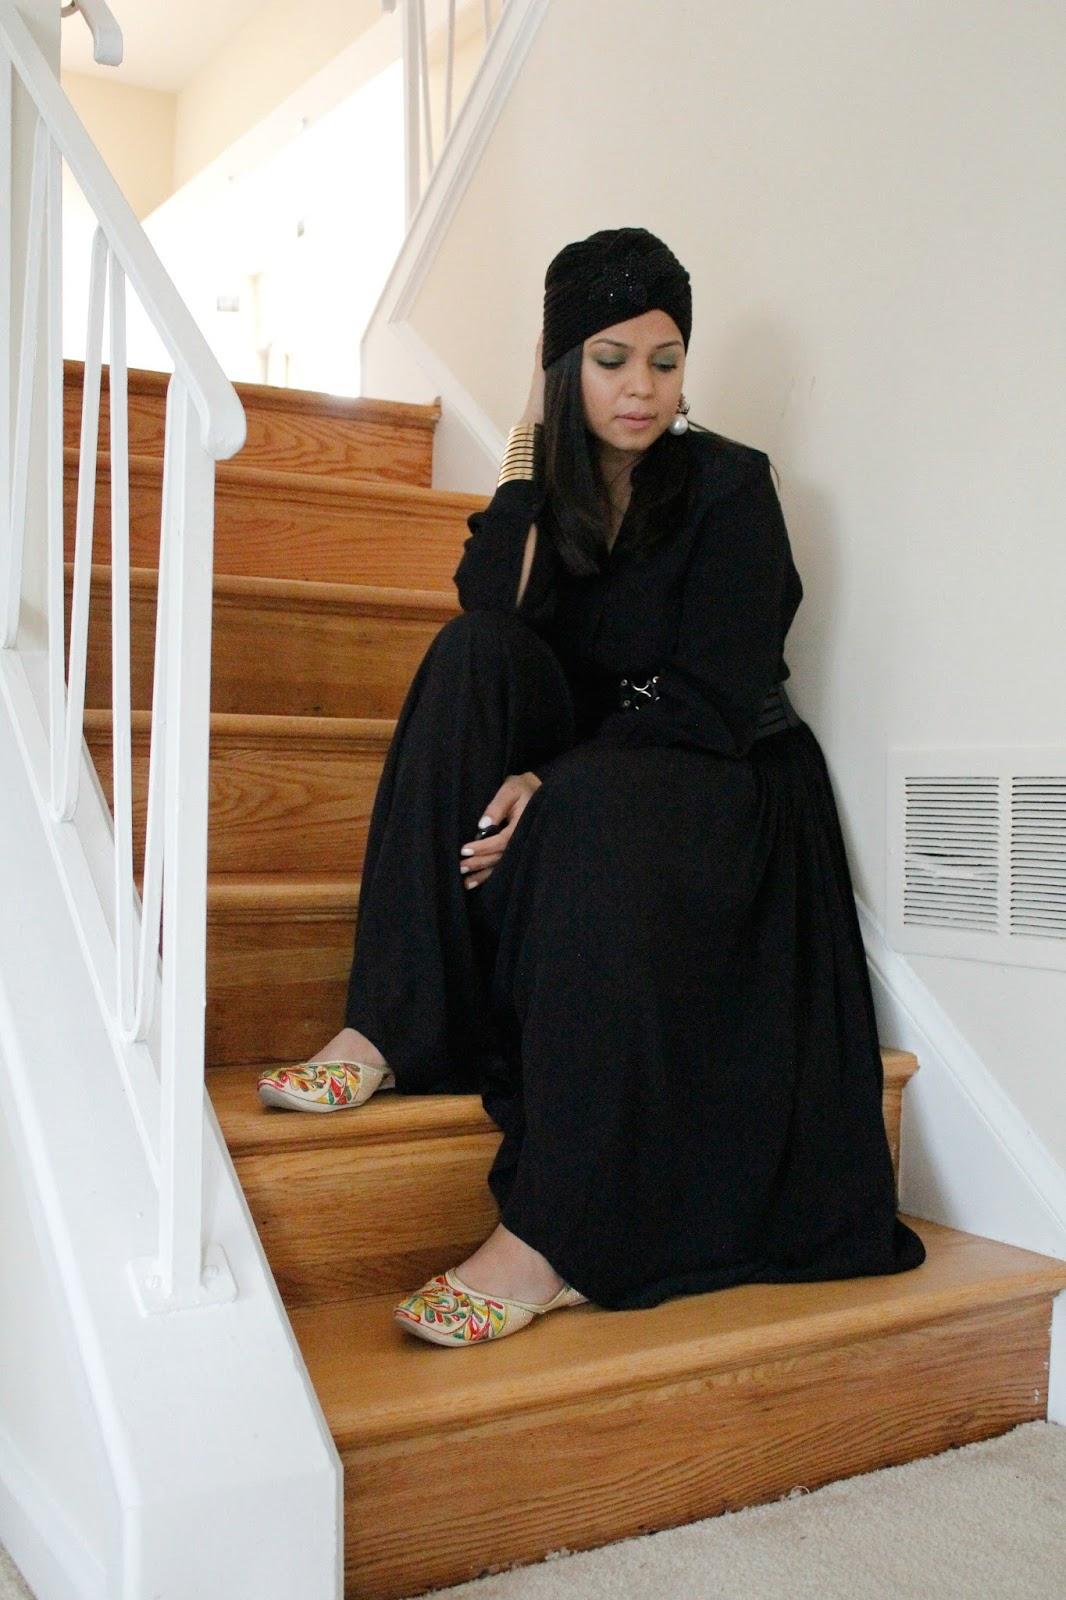 H & M dress, harness belt, black monochromatic look